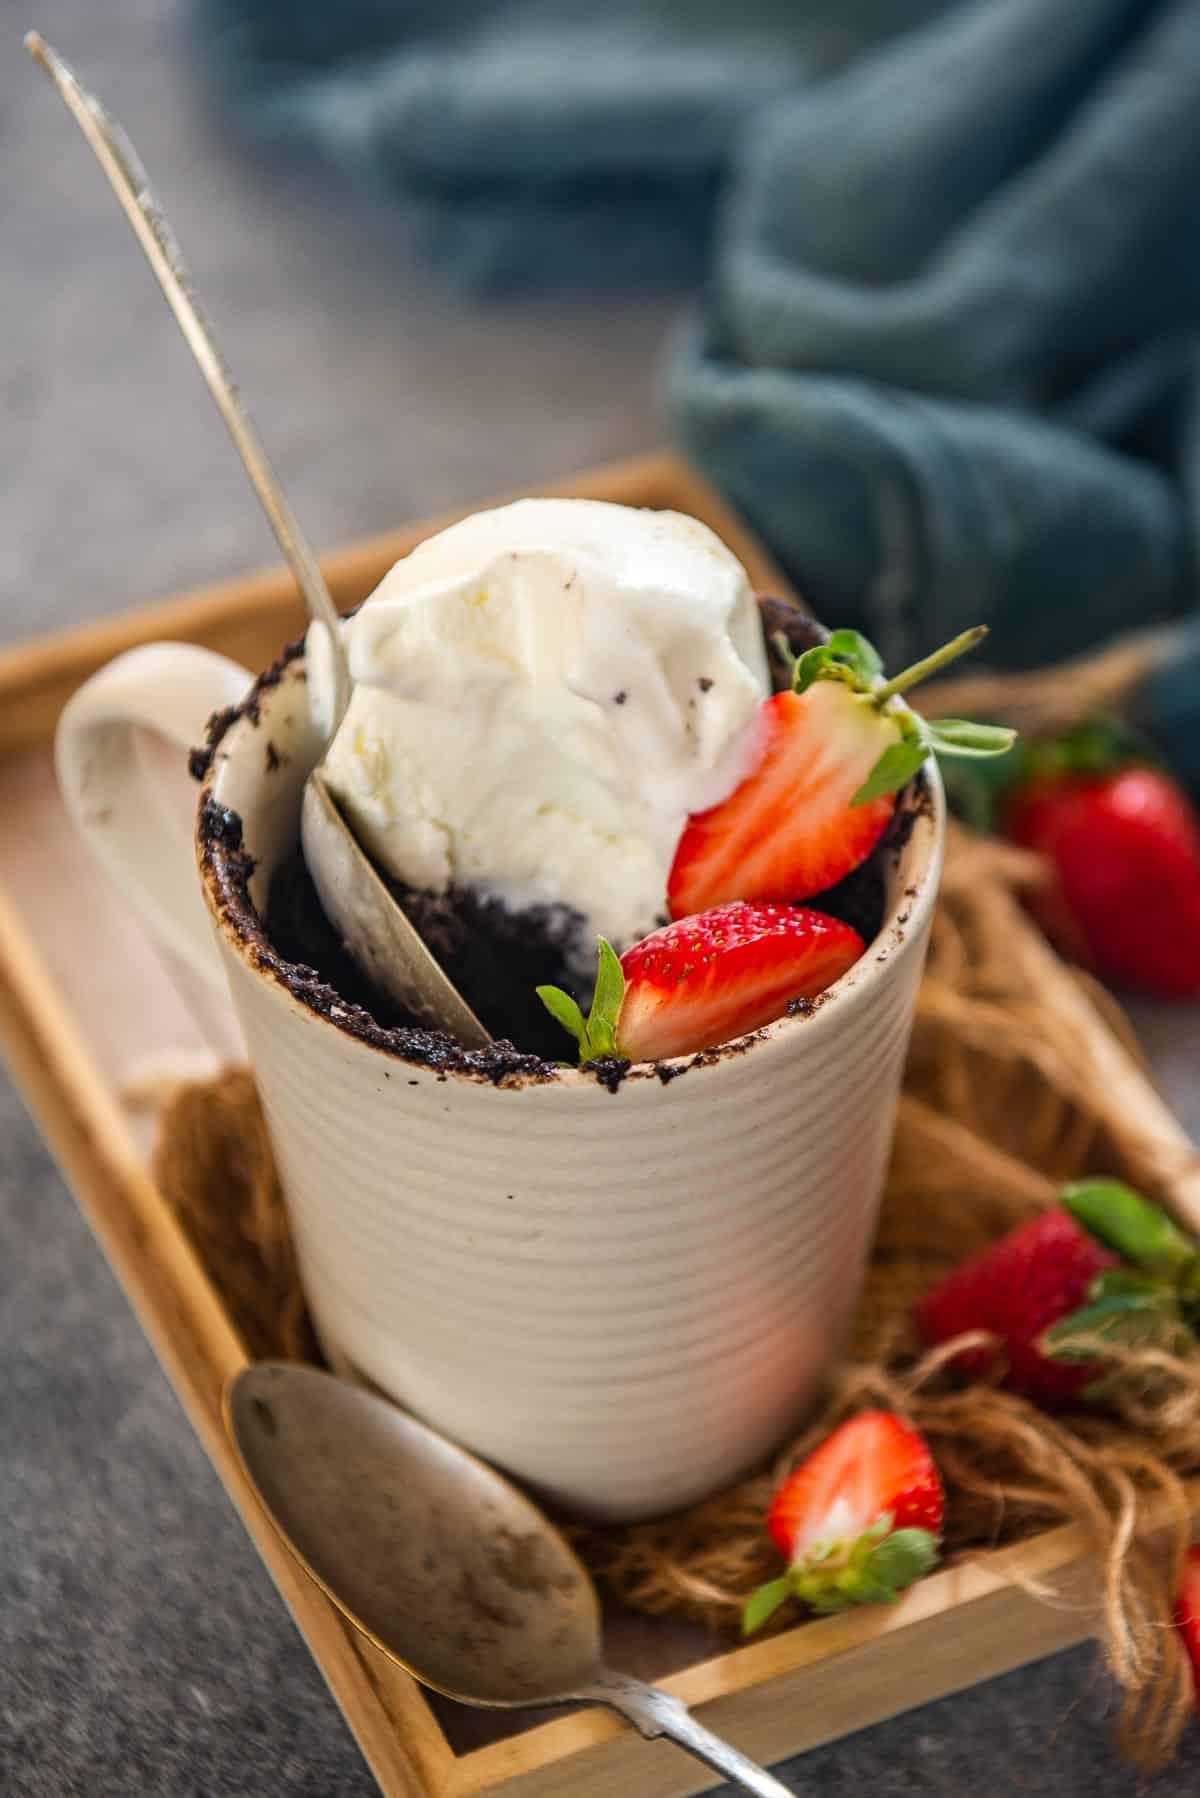 Microwave lava cake served with vanilla ice cream.